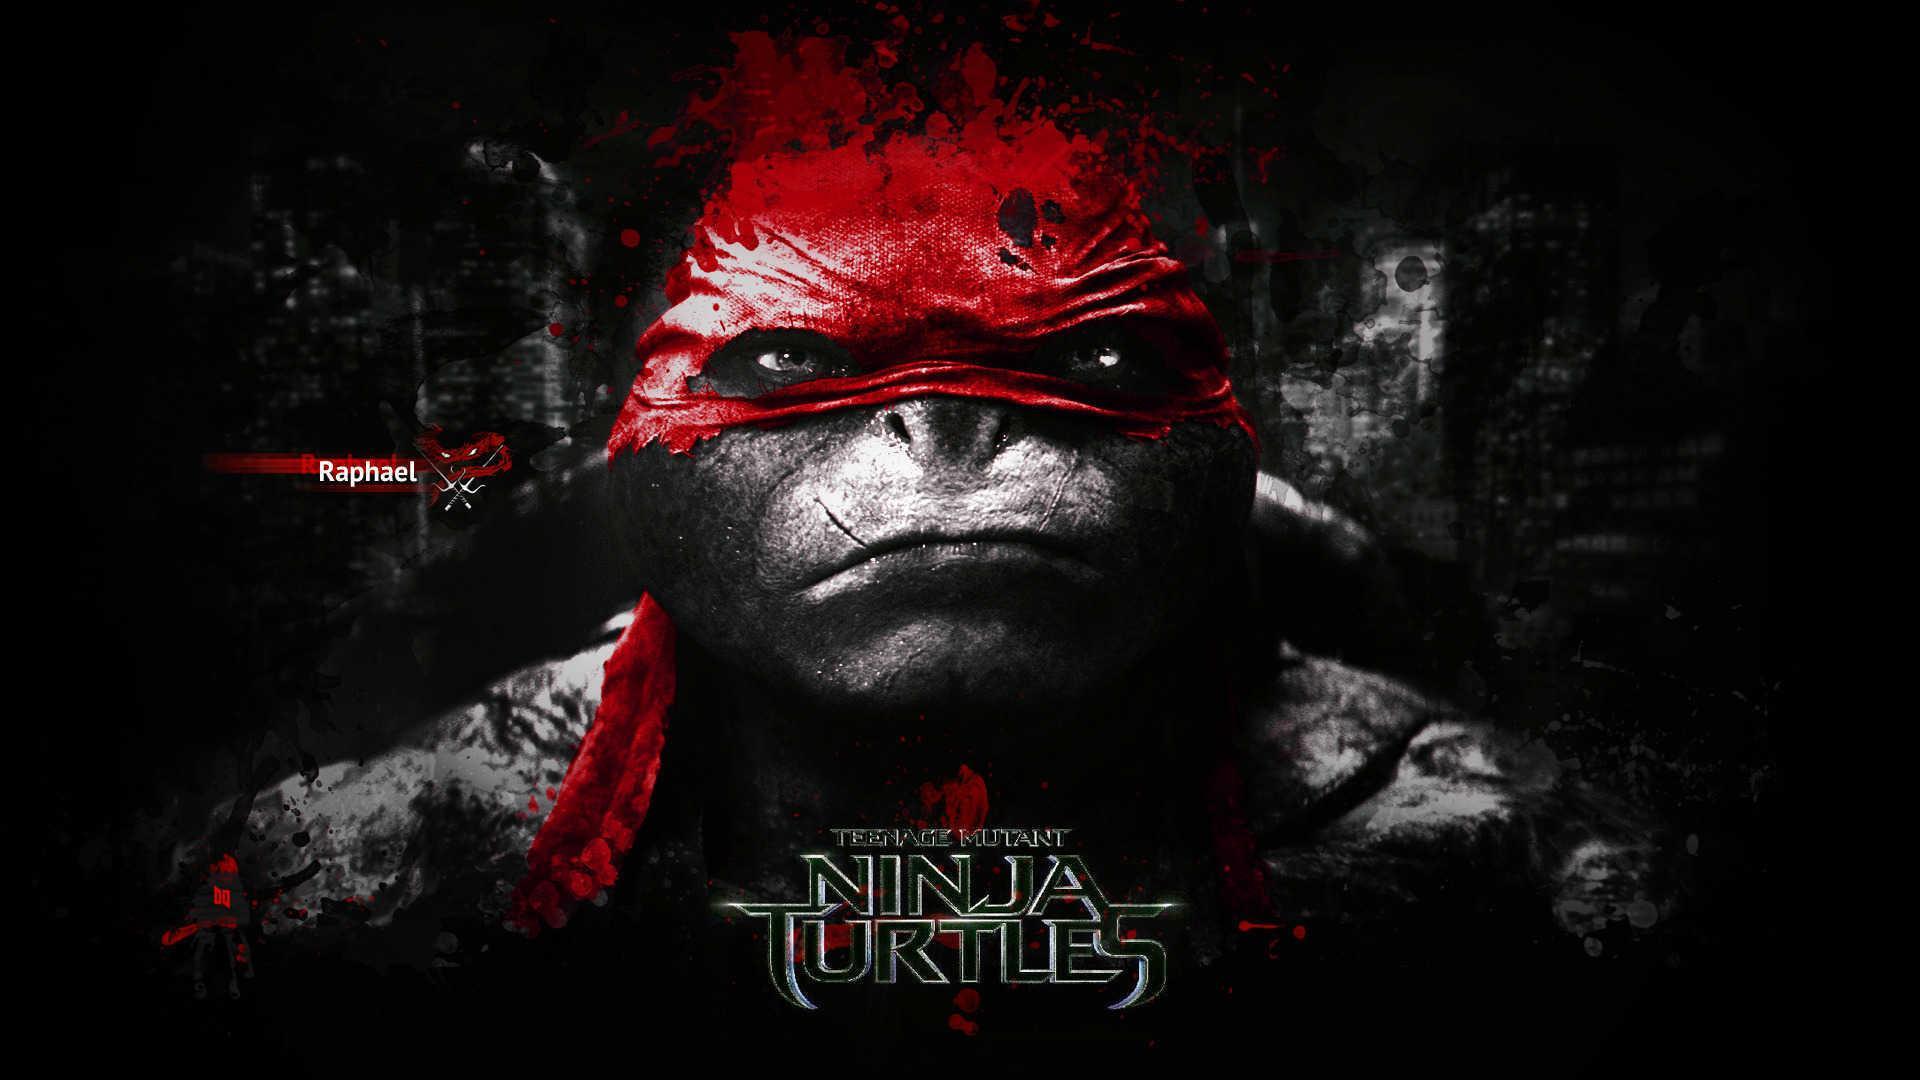 Ninja Turtles HD Wallpapers - Wallpaper Cave